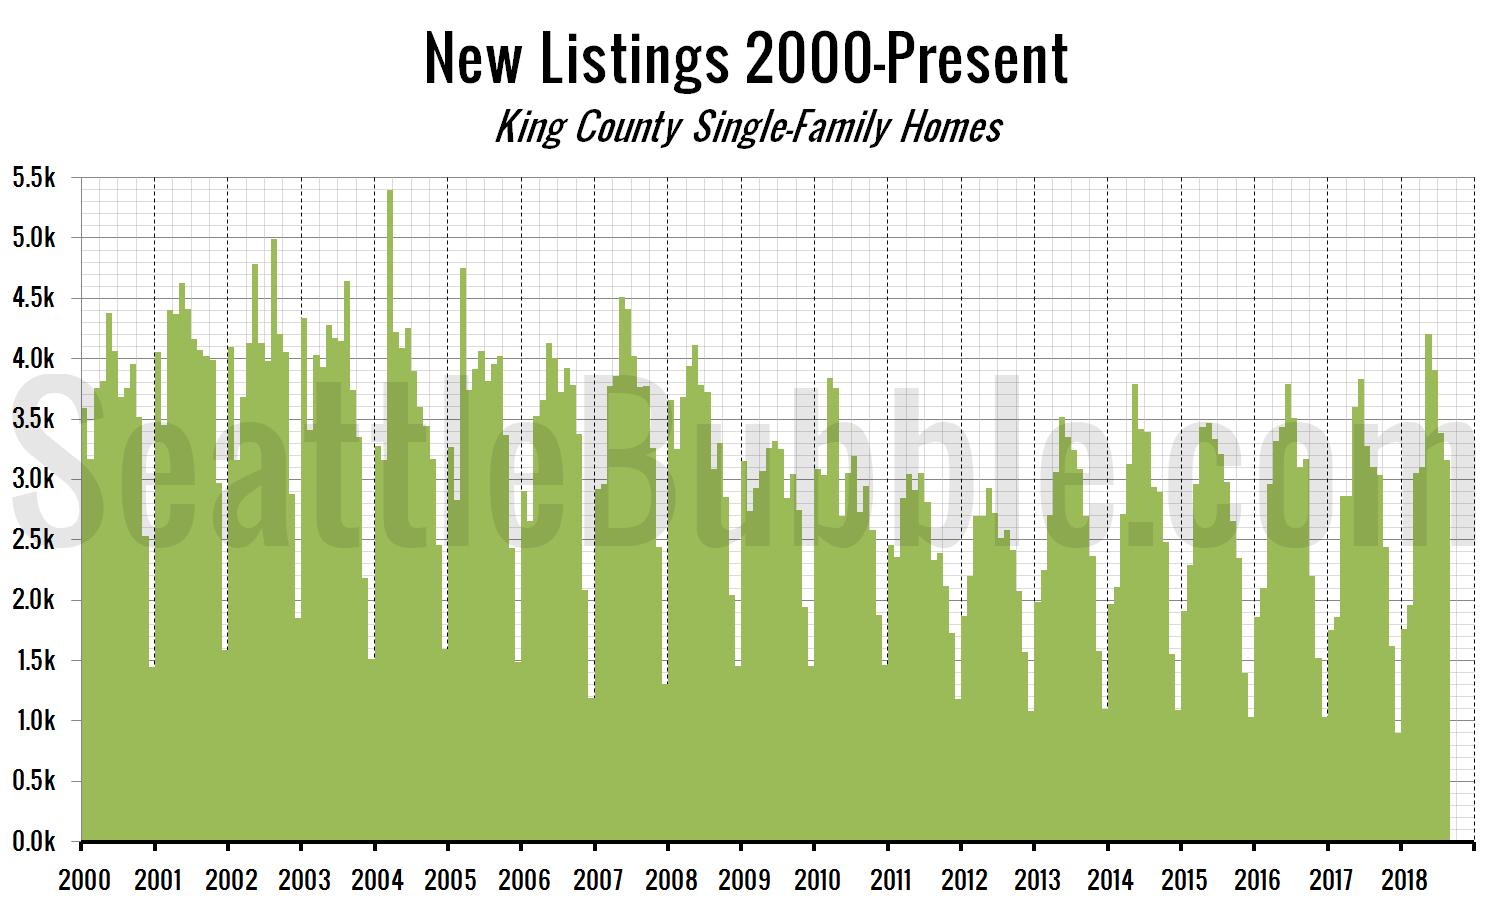 New Listings 2000-Present